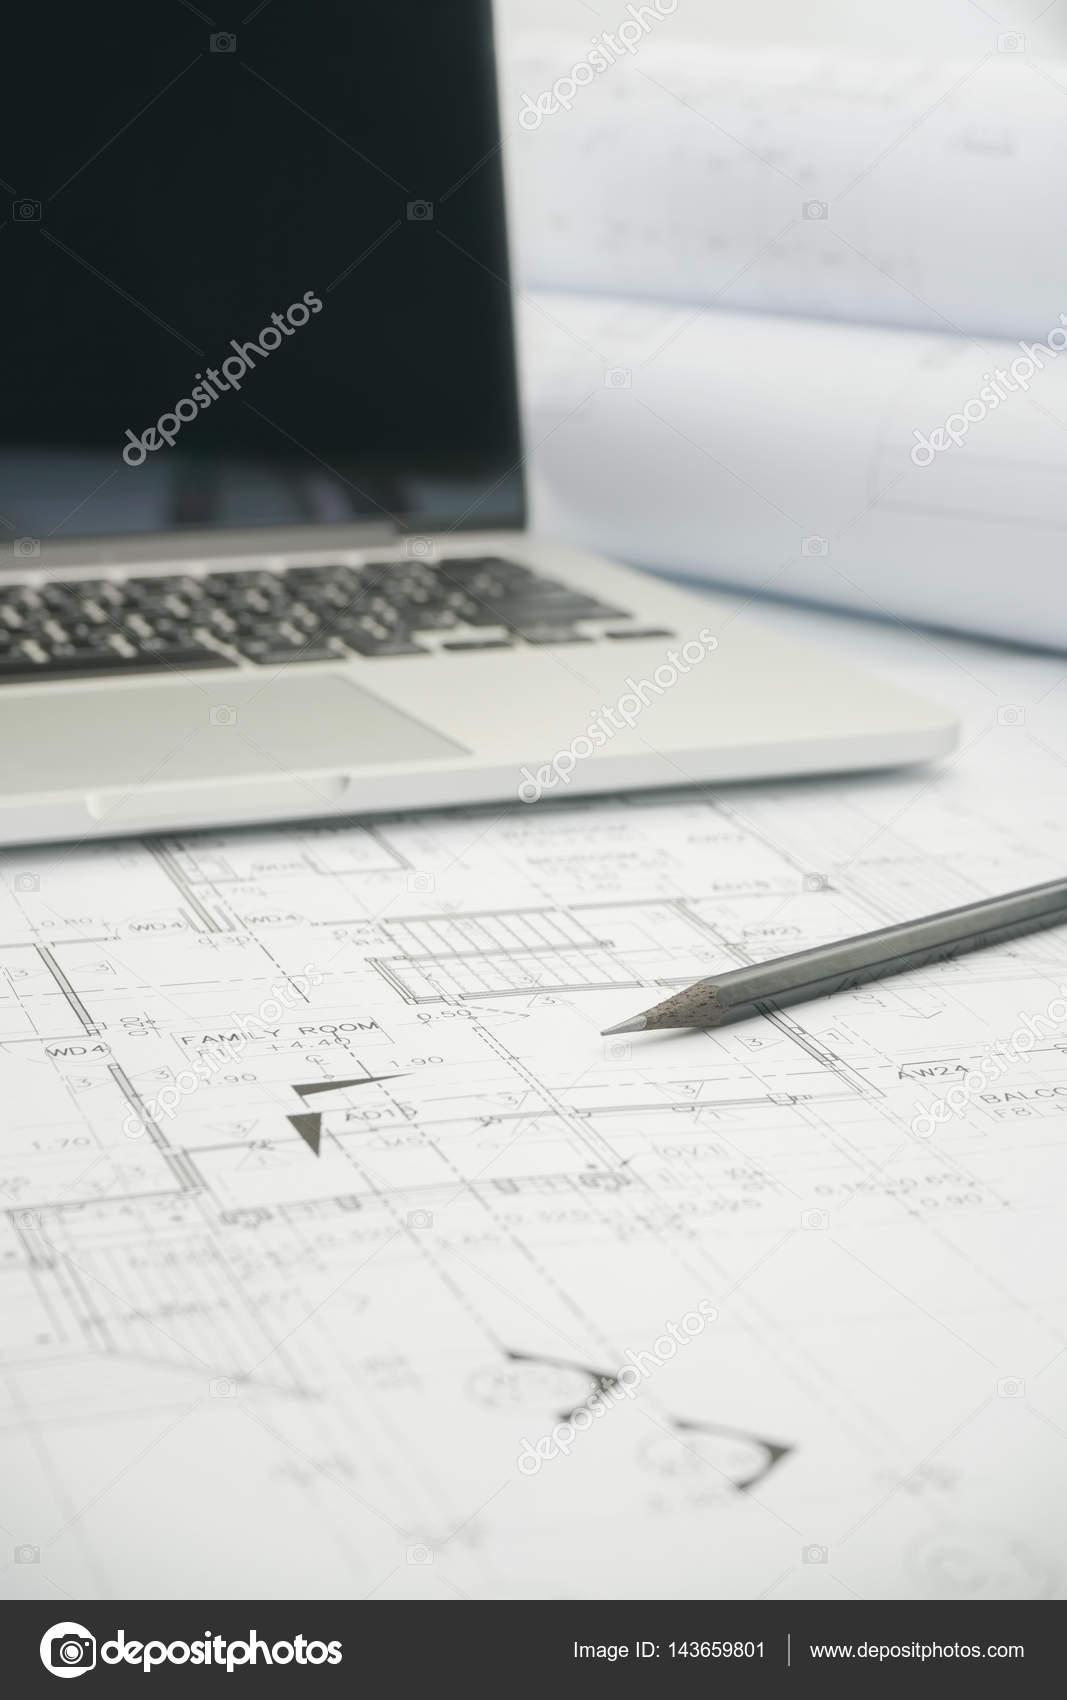 Negro lpiz y computadora porttil de papel de dibujo arquitectnico negro lpiz y computadora porttil de papel de dibujo arquitectnico para la construccin fotos de malvernweather Image collections